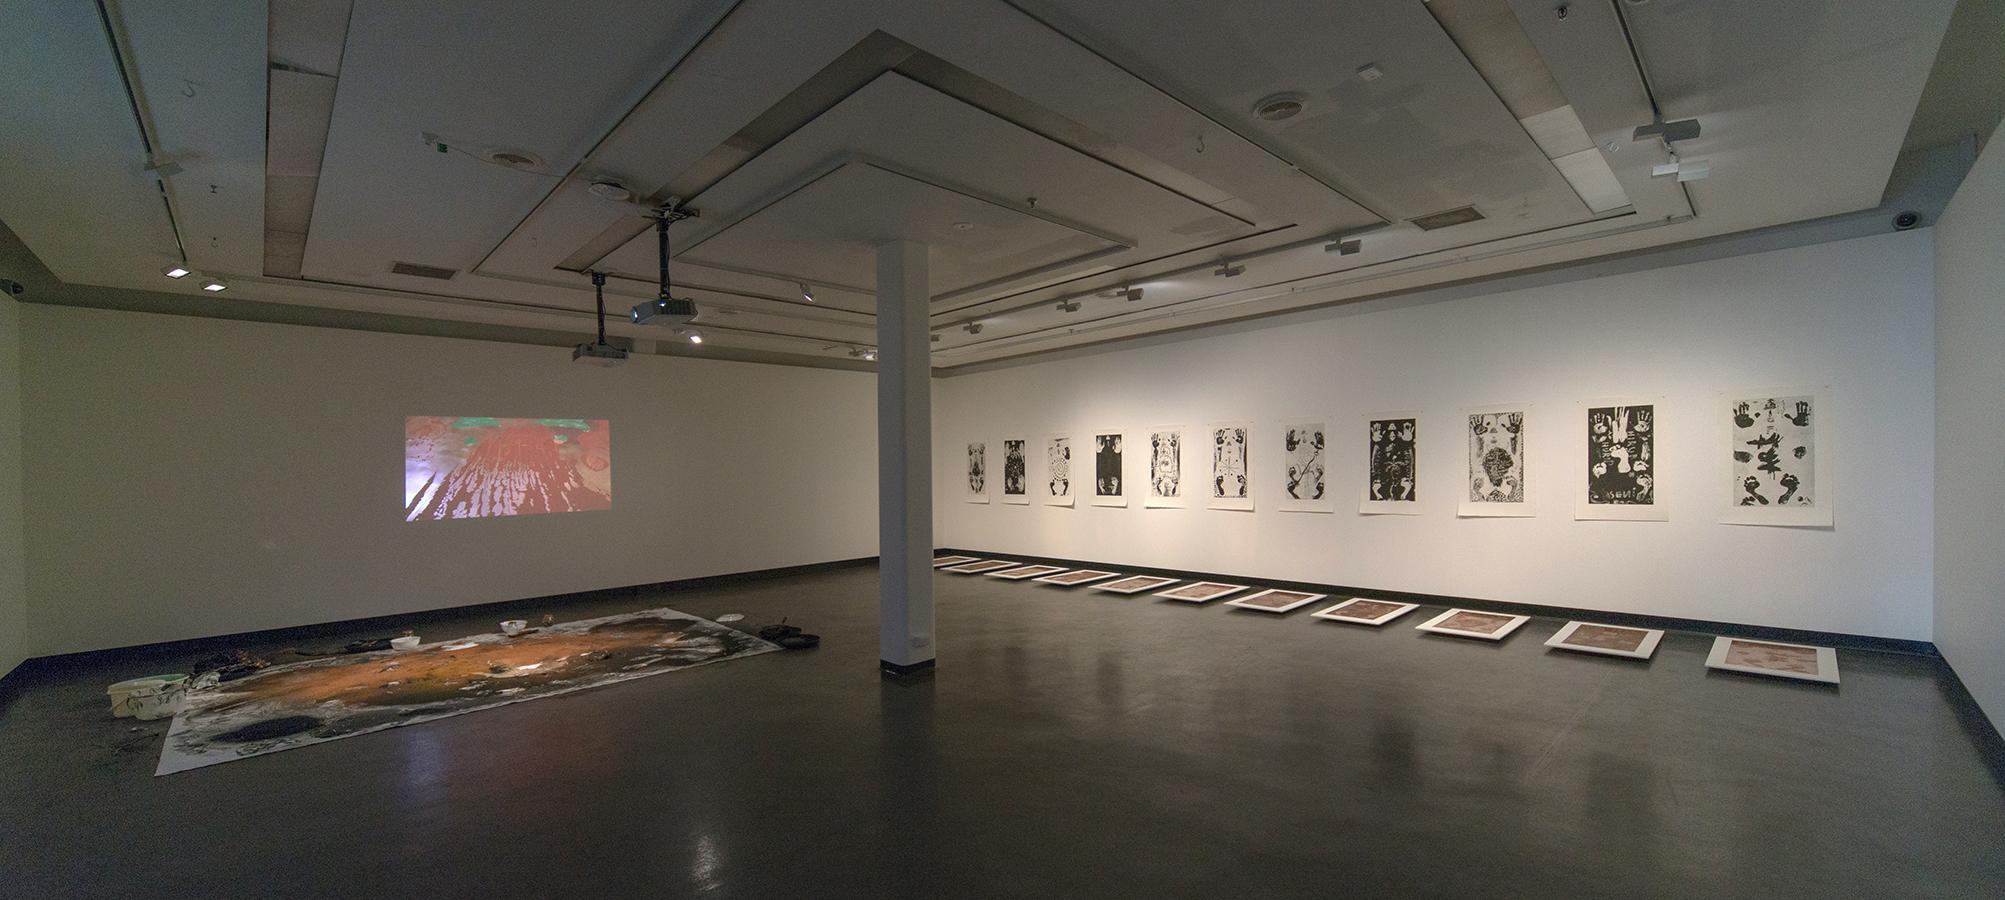 Tisna Sanjaya, Installation View, 2018